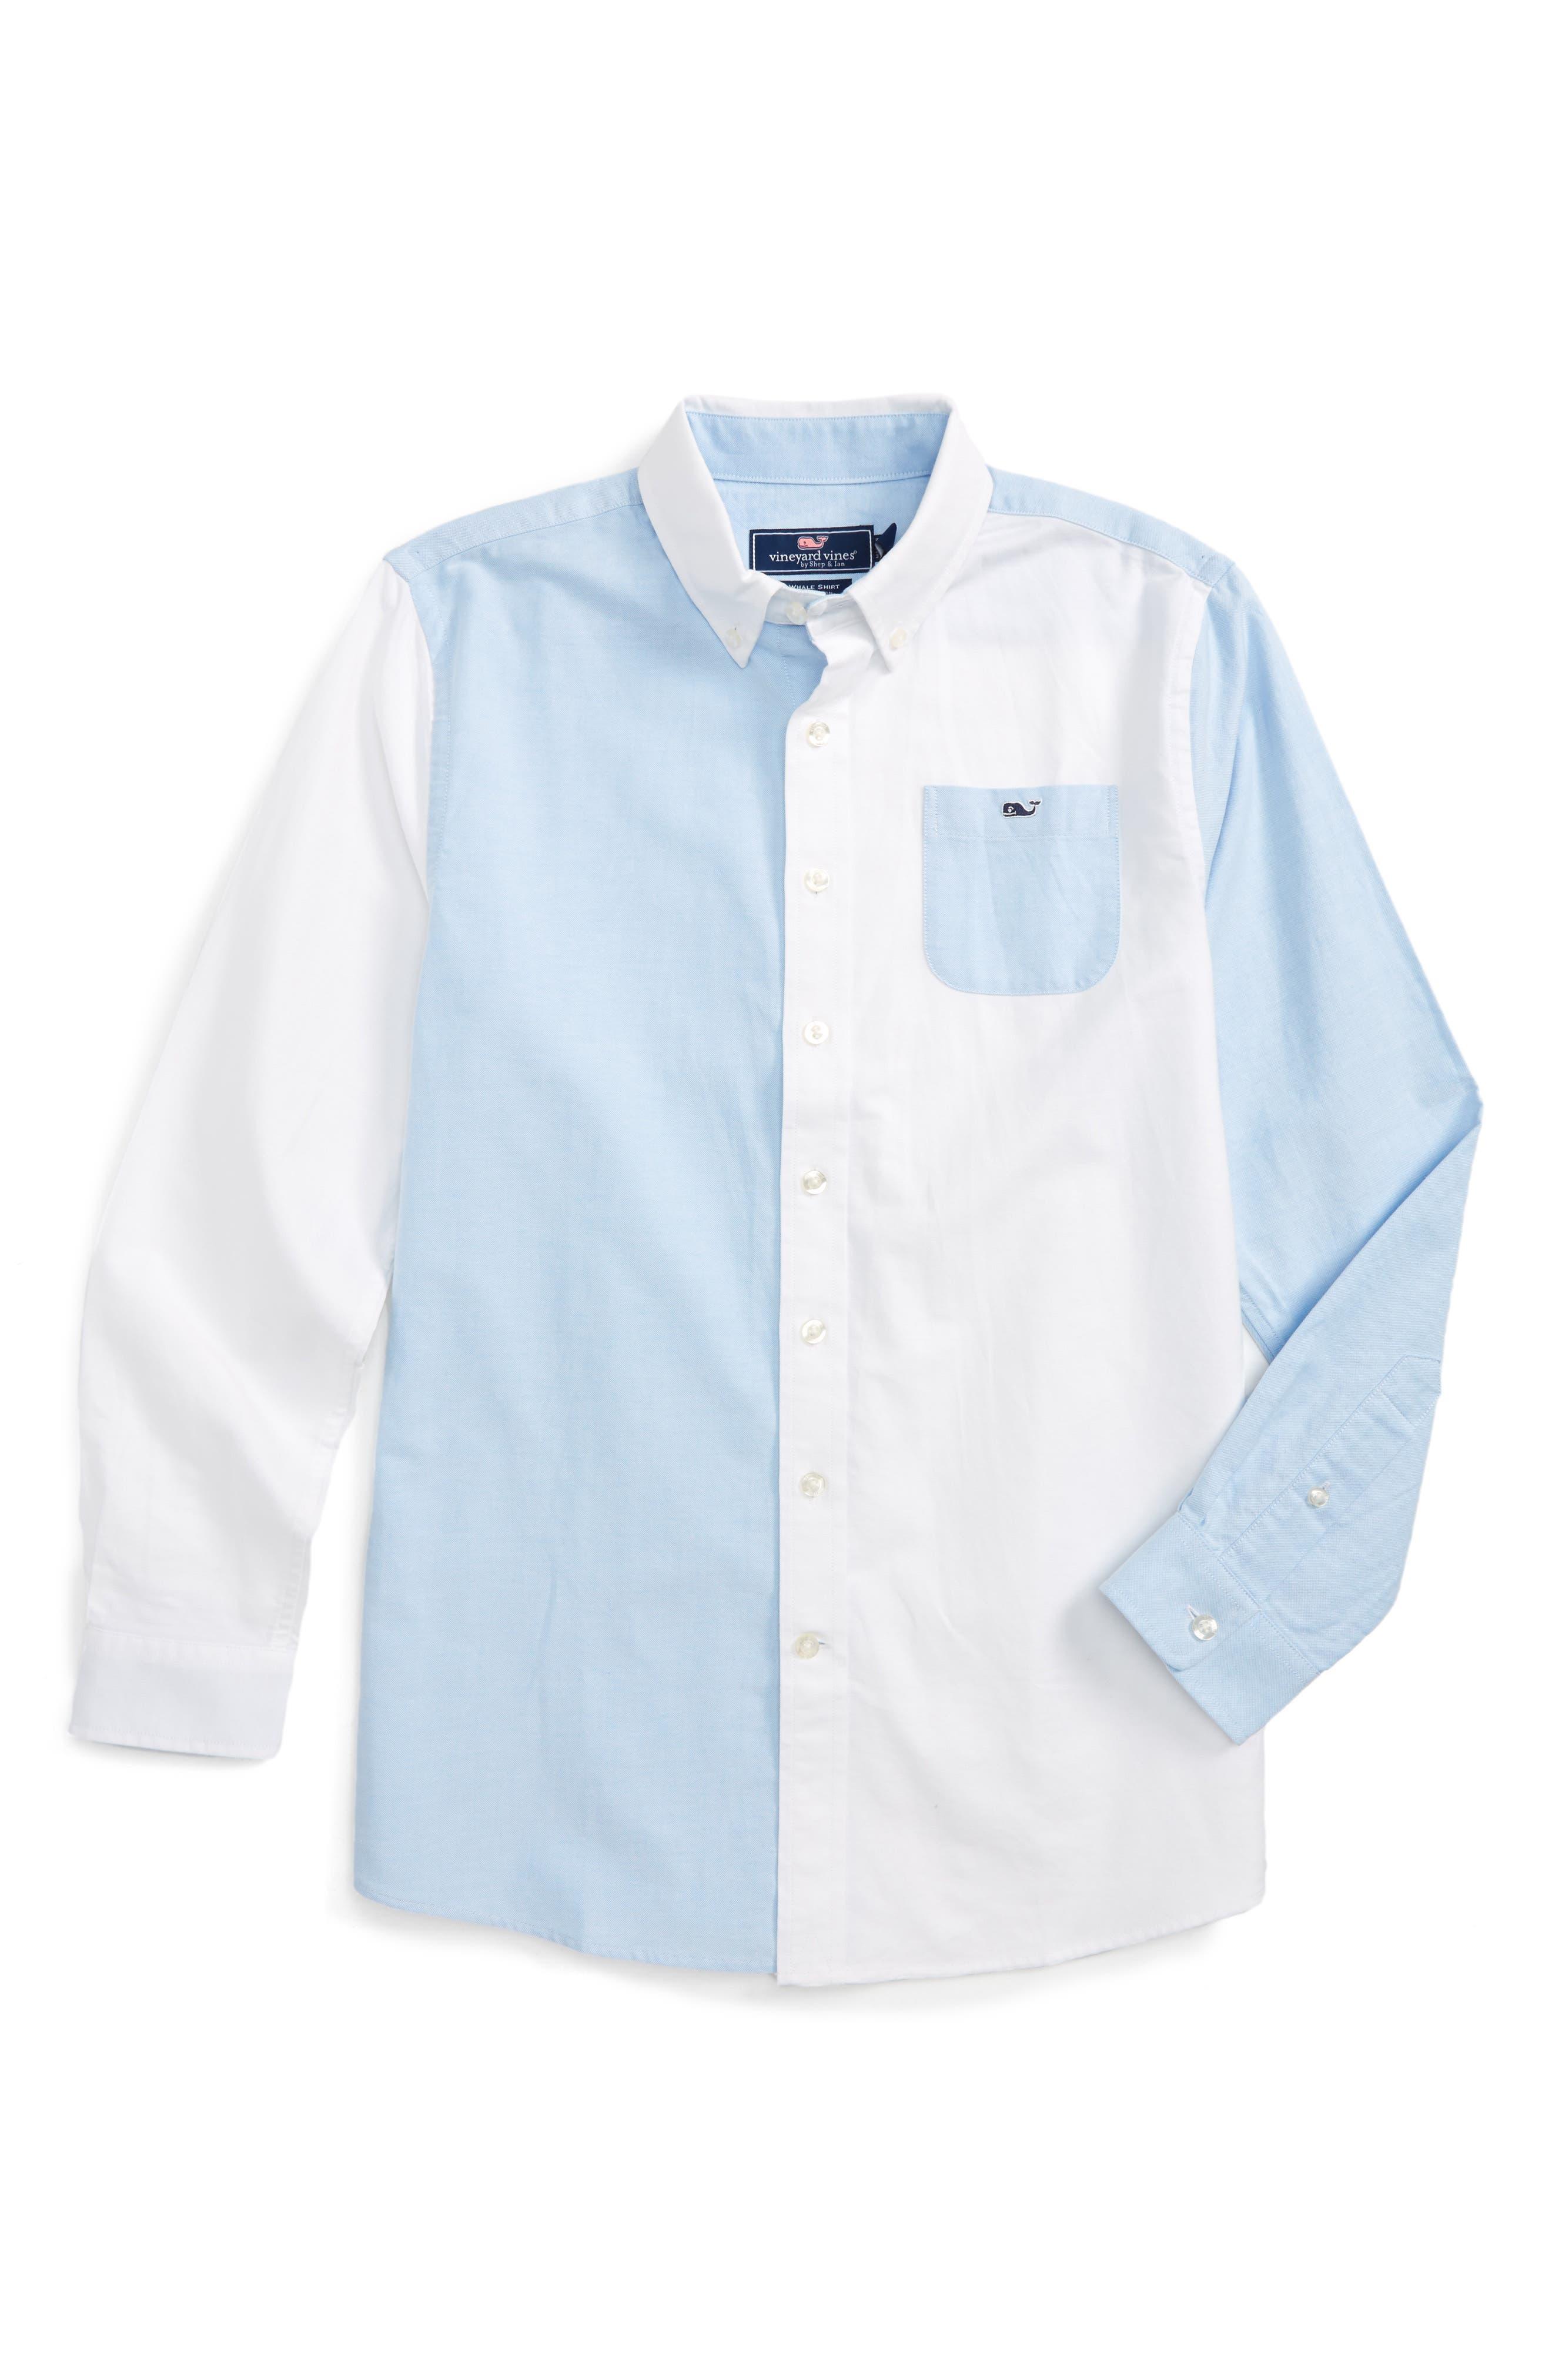 Party Whale Oxford Shirt,                             Main thumbnail 1, color,                             408